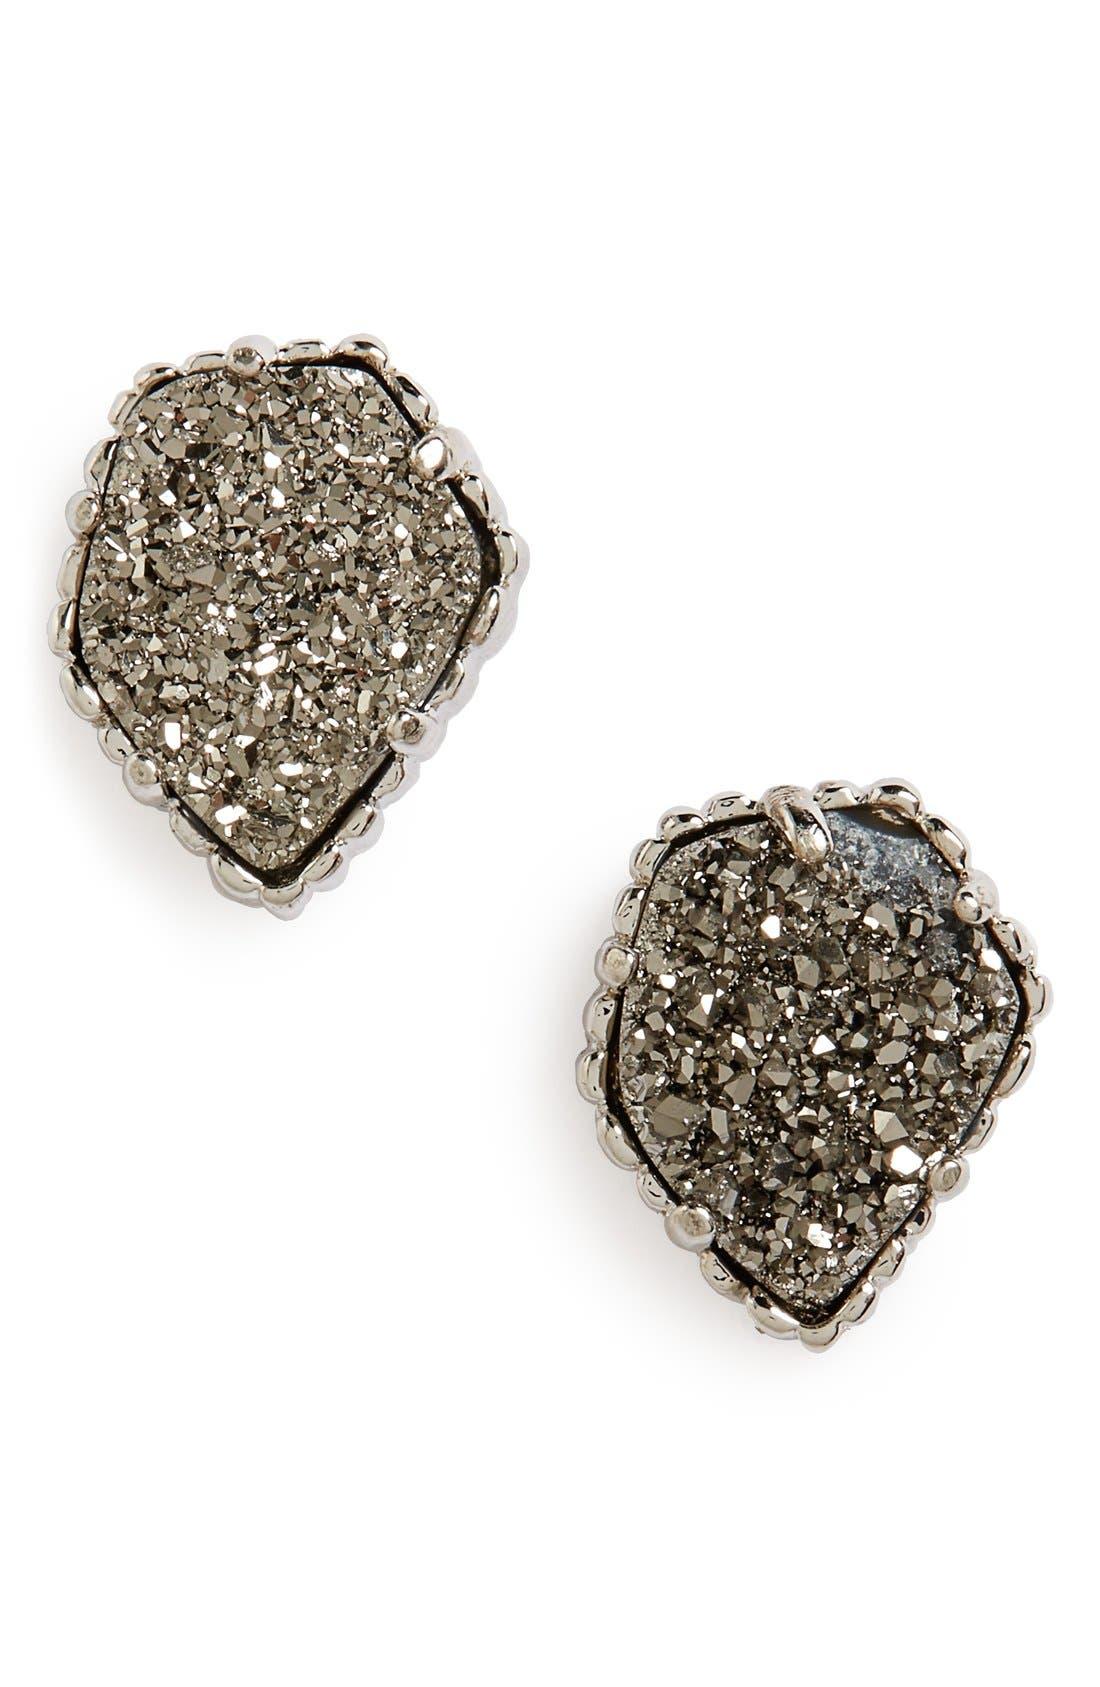 Alternate Image 1 Selected - Kendra Scott Tessa Stone Stud Earrings